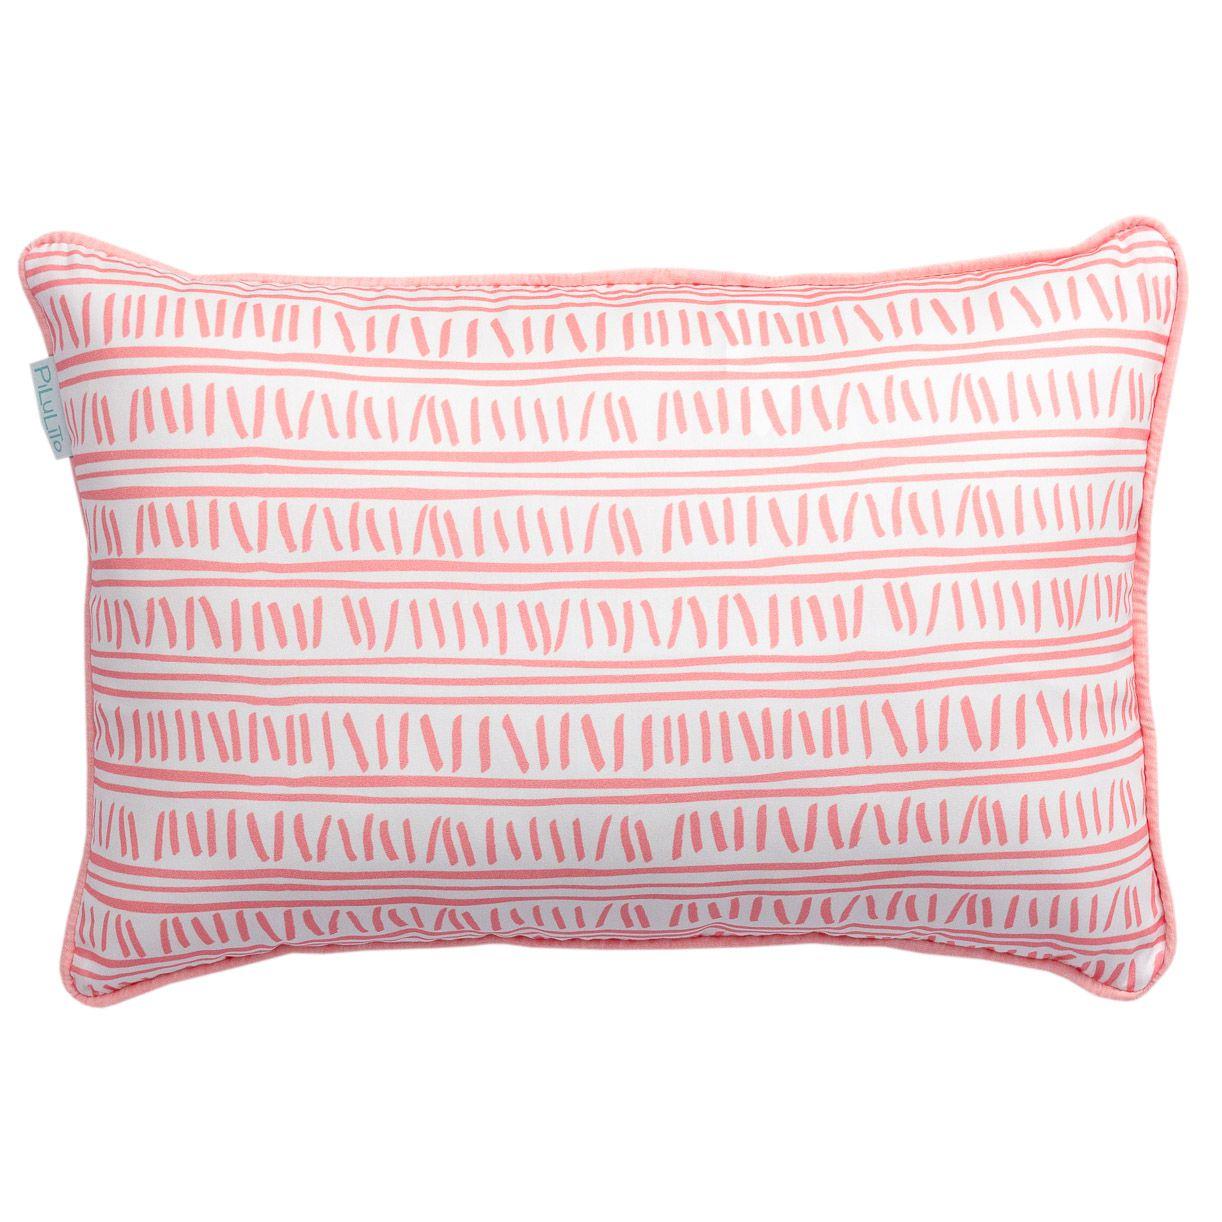 Capa de almofada de cabeceira 60x40cm trilha rosa